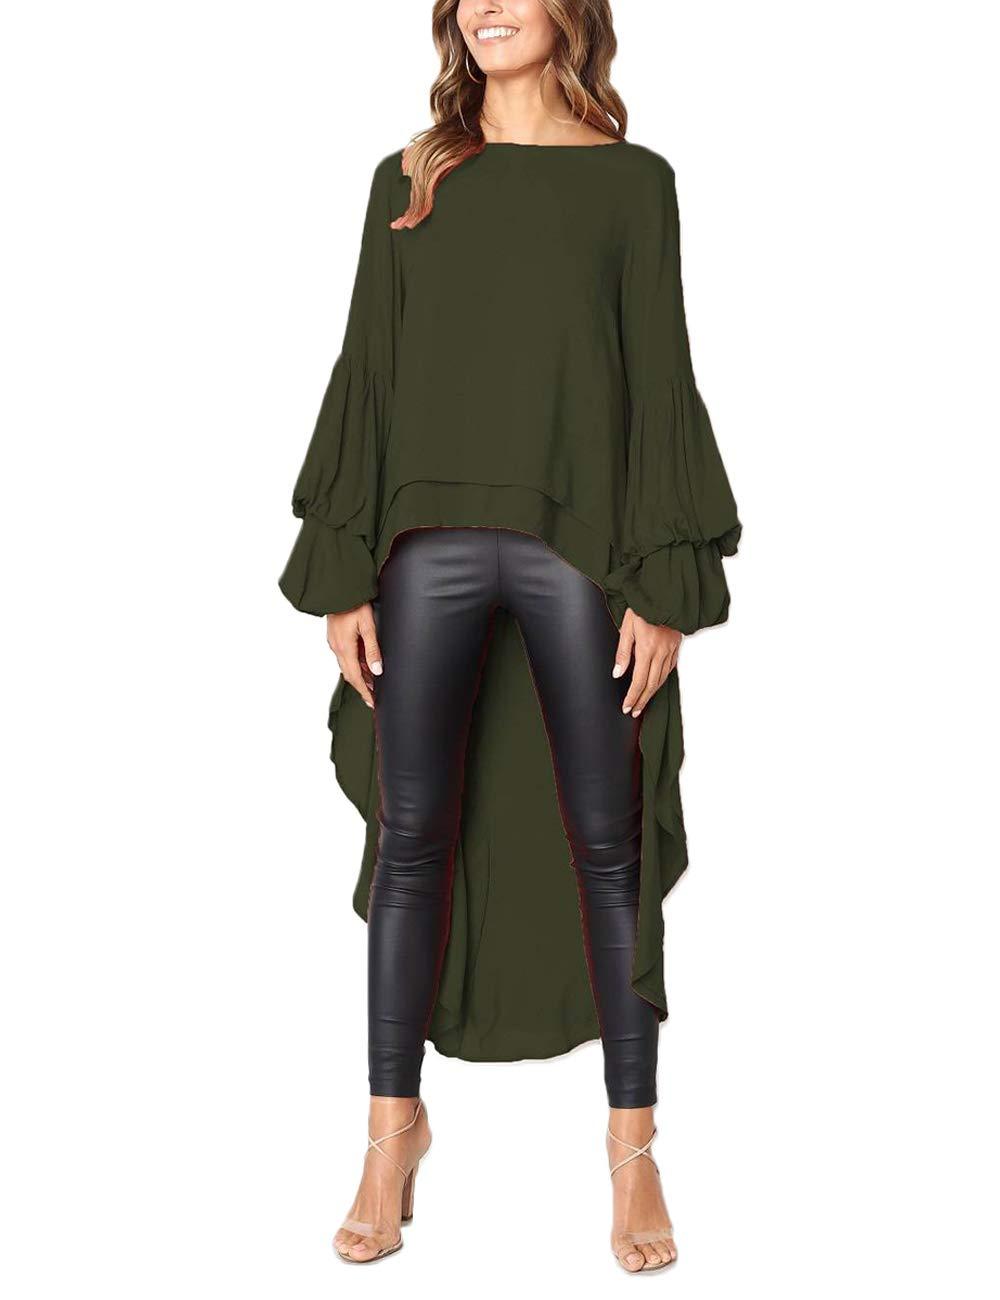 PICK YOUR LOOK Women's Lantern Long Sleeve Tunic Asymmetrical Top Blouse Shirt Dress